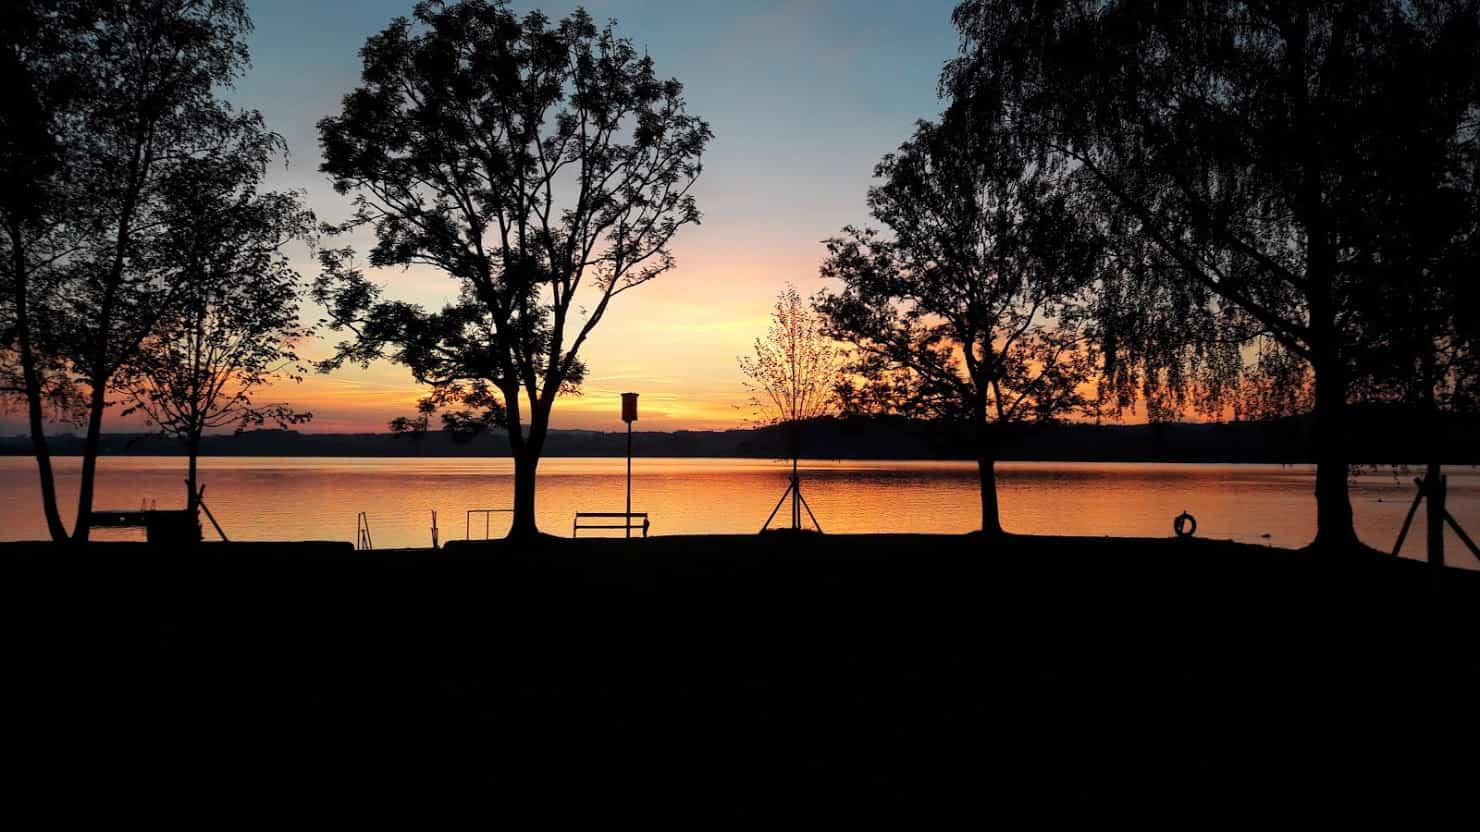 Wallersee bei Sonnenuntergang